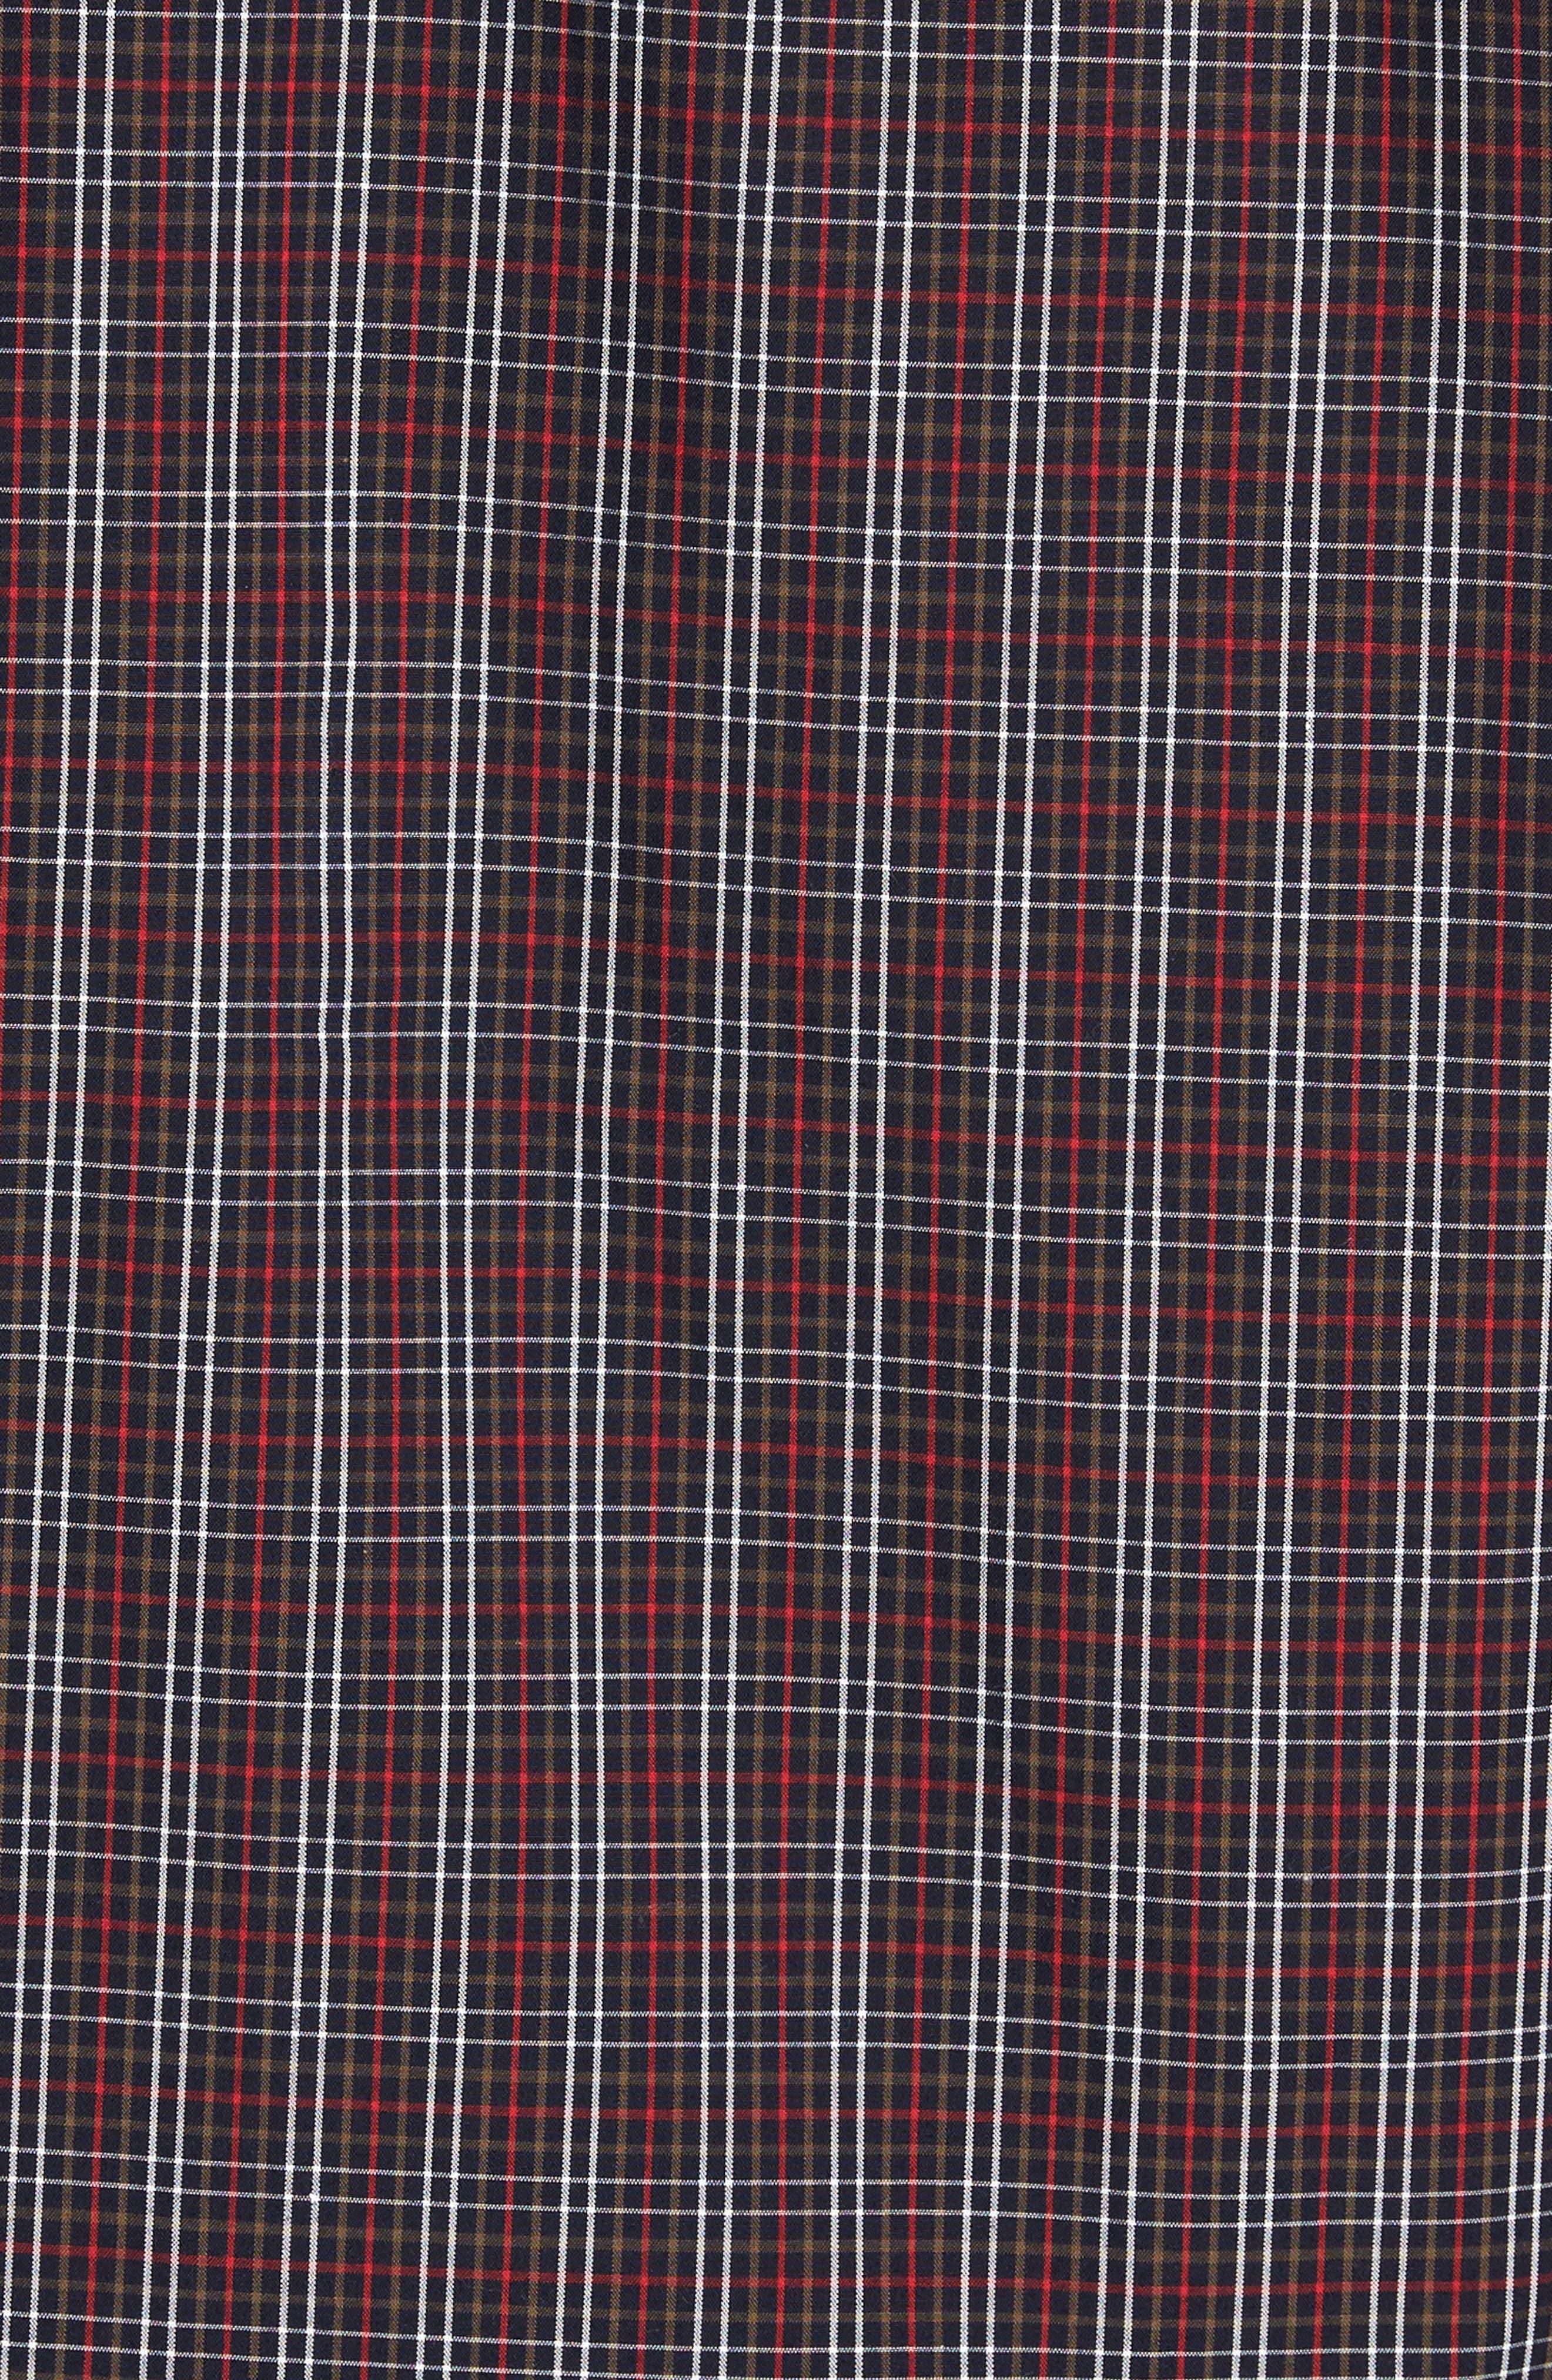 Cavanah Non-Iron Plaid Sport Shirt,                             Alternate thumbnail 5, color,                             493